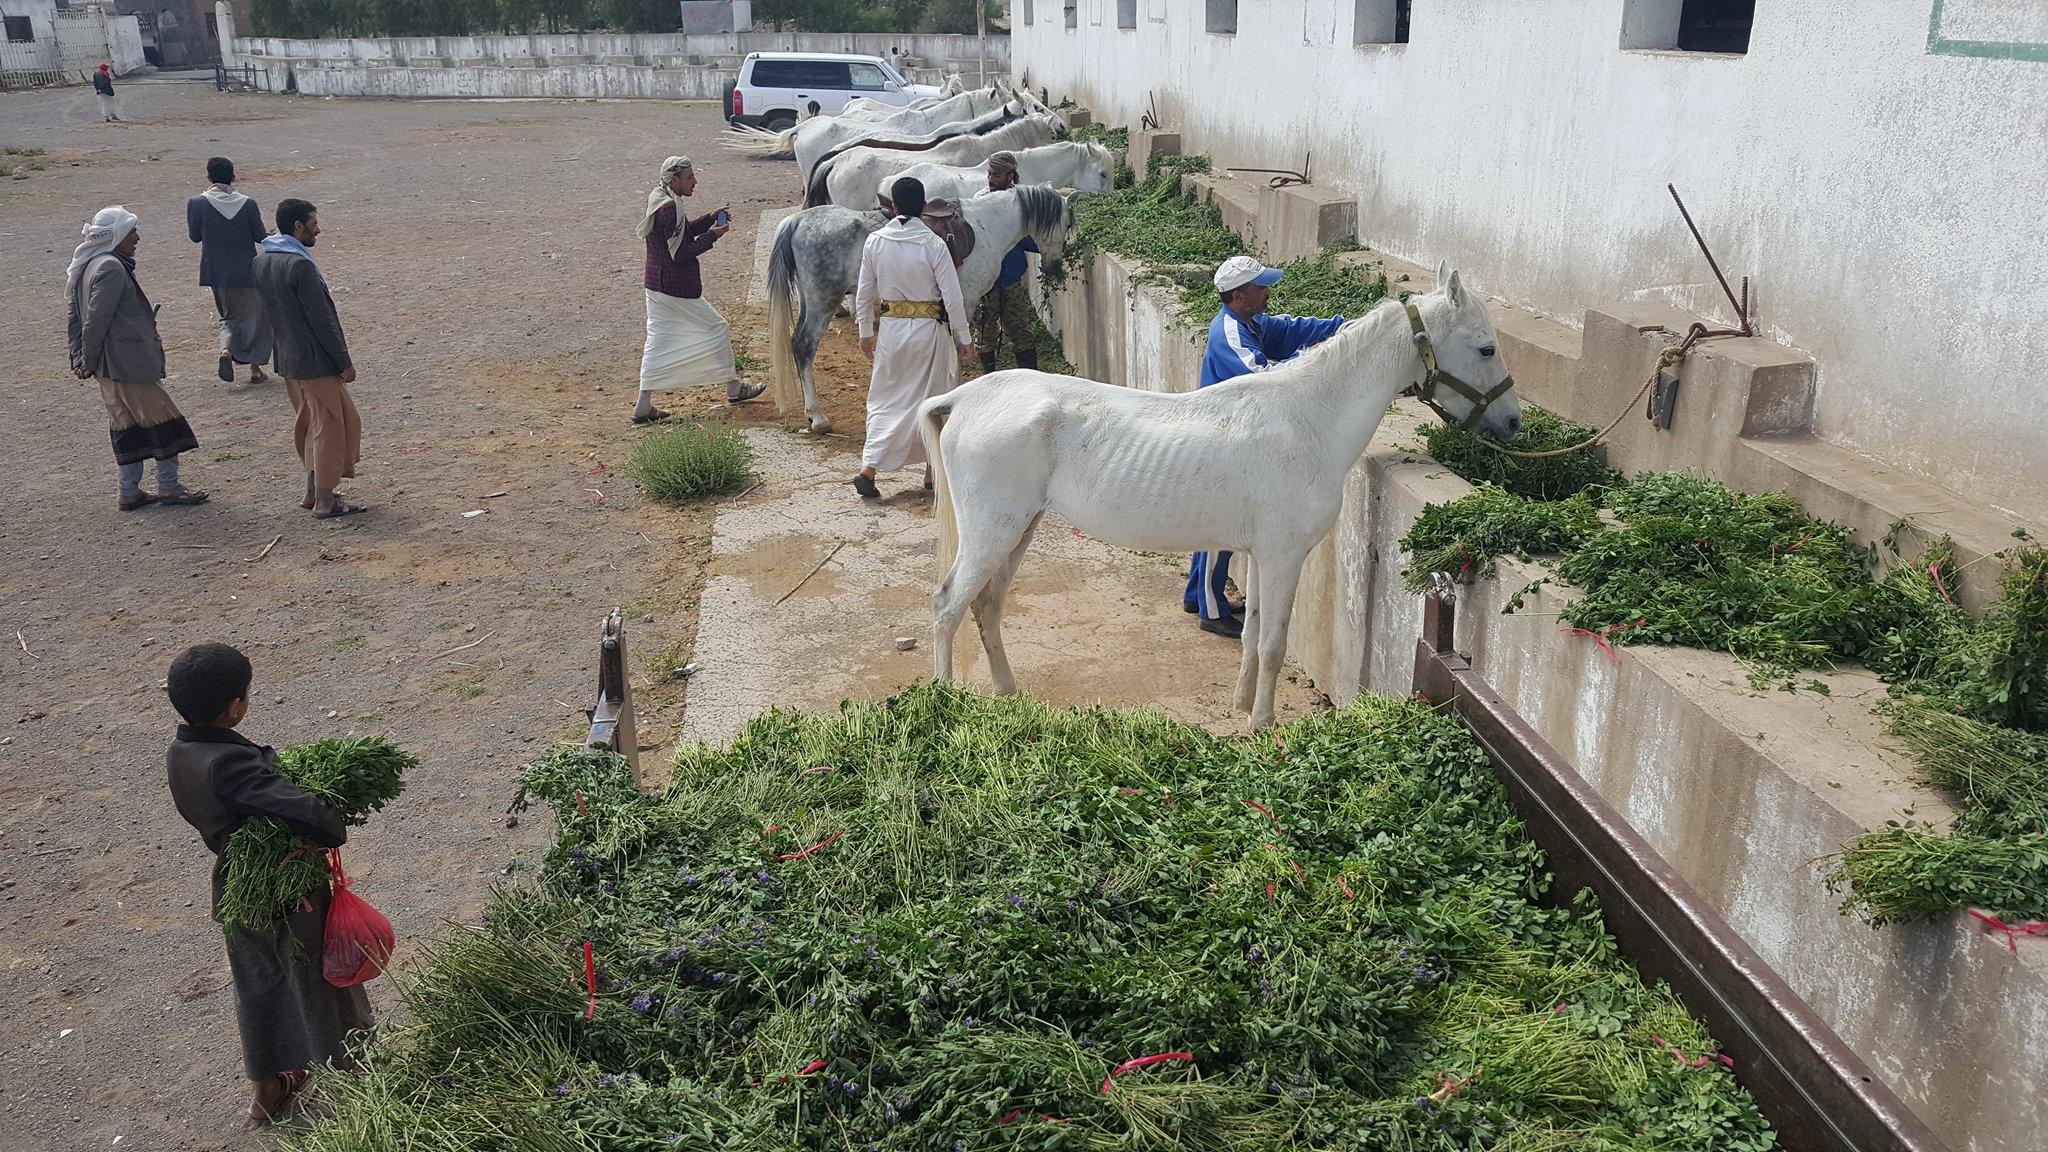 dhamar q'rab horses bringing them out to eat 16 NOV 2018  OWAP-AR.jpg